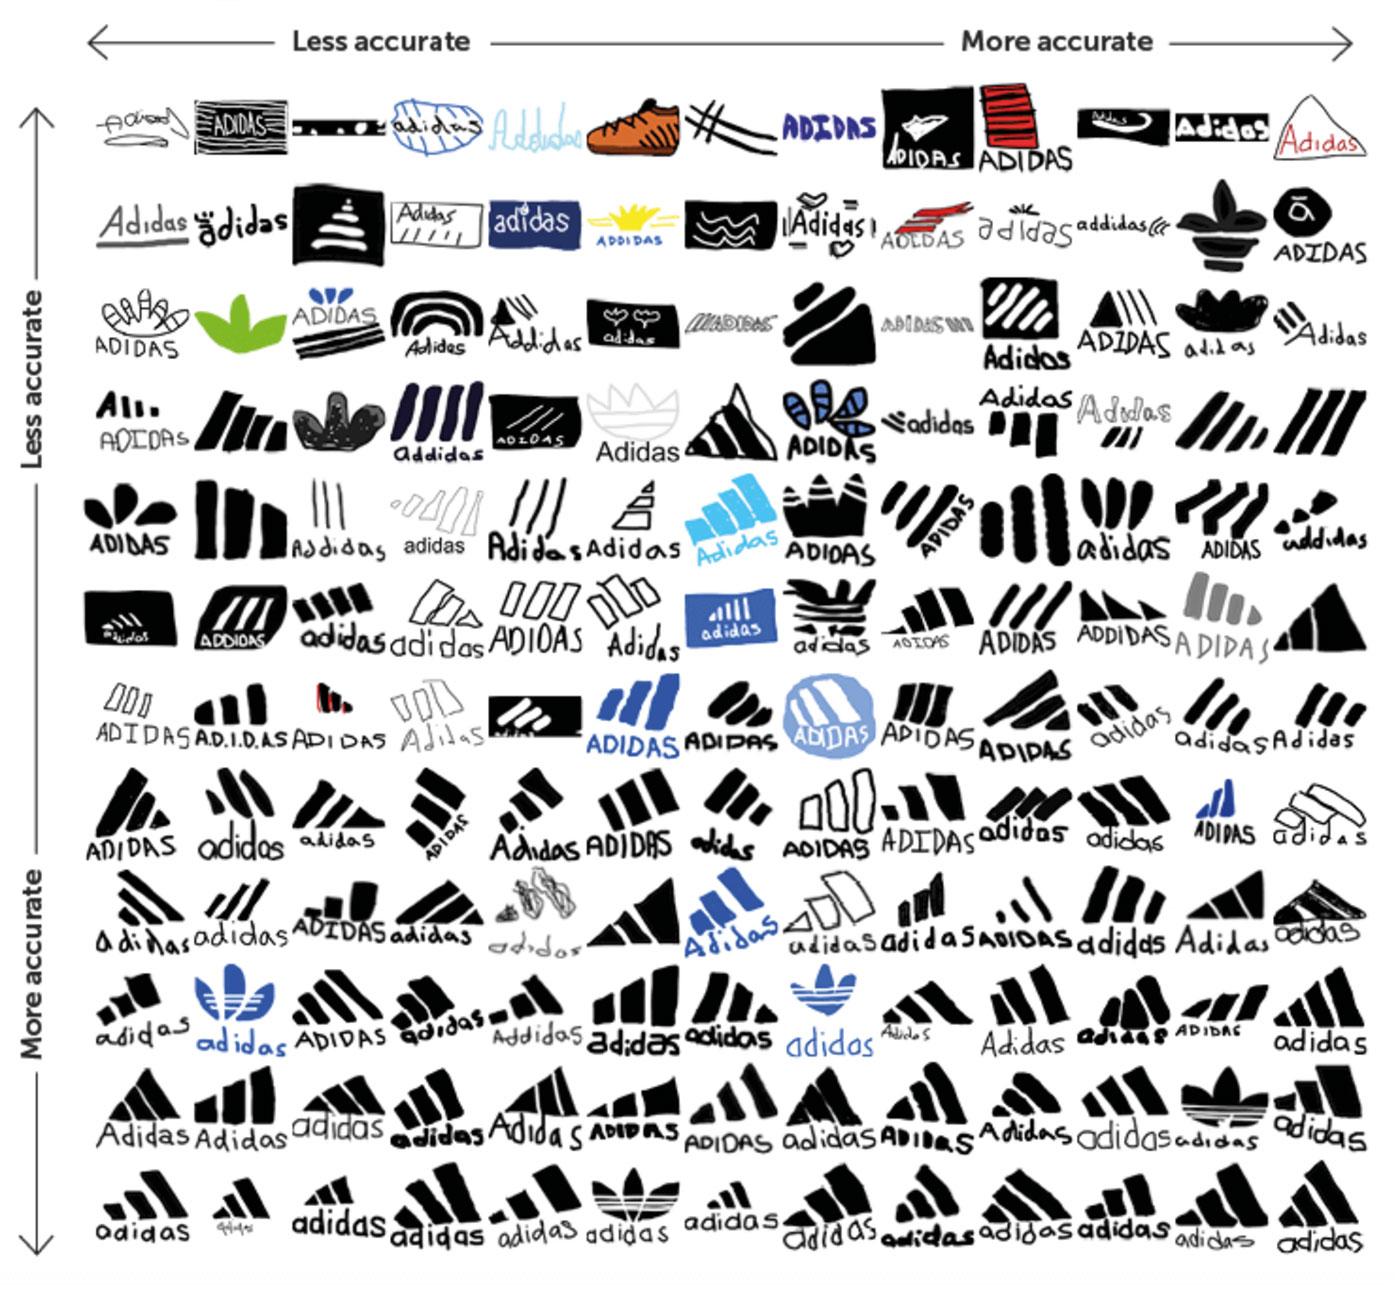 Adidas logo from memory